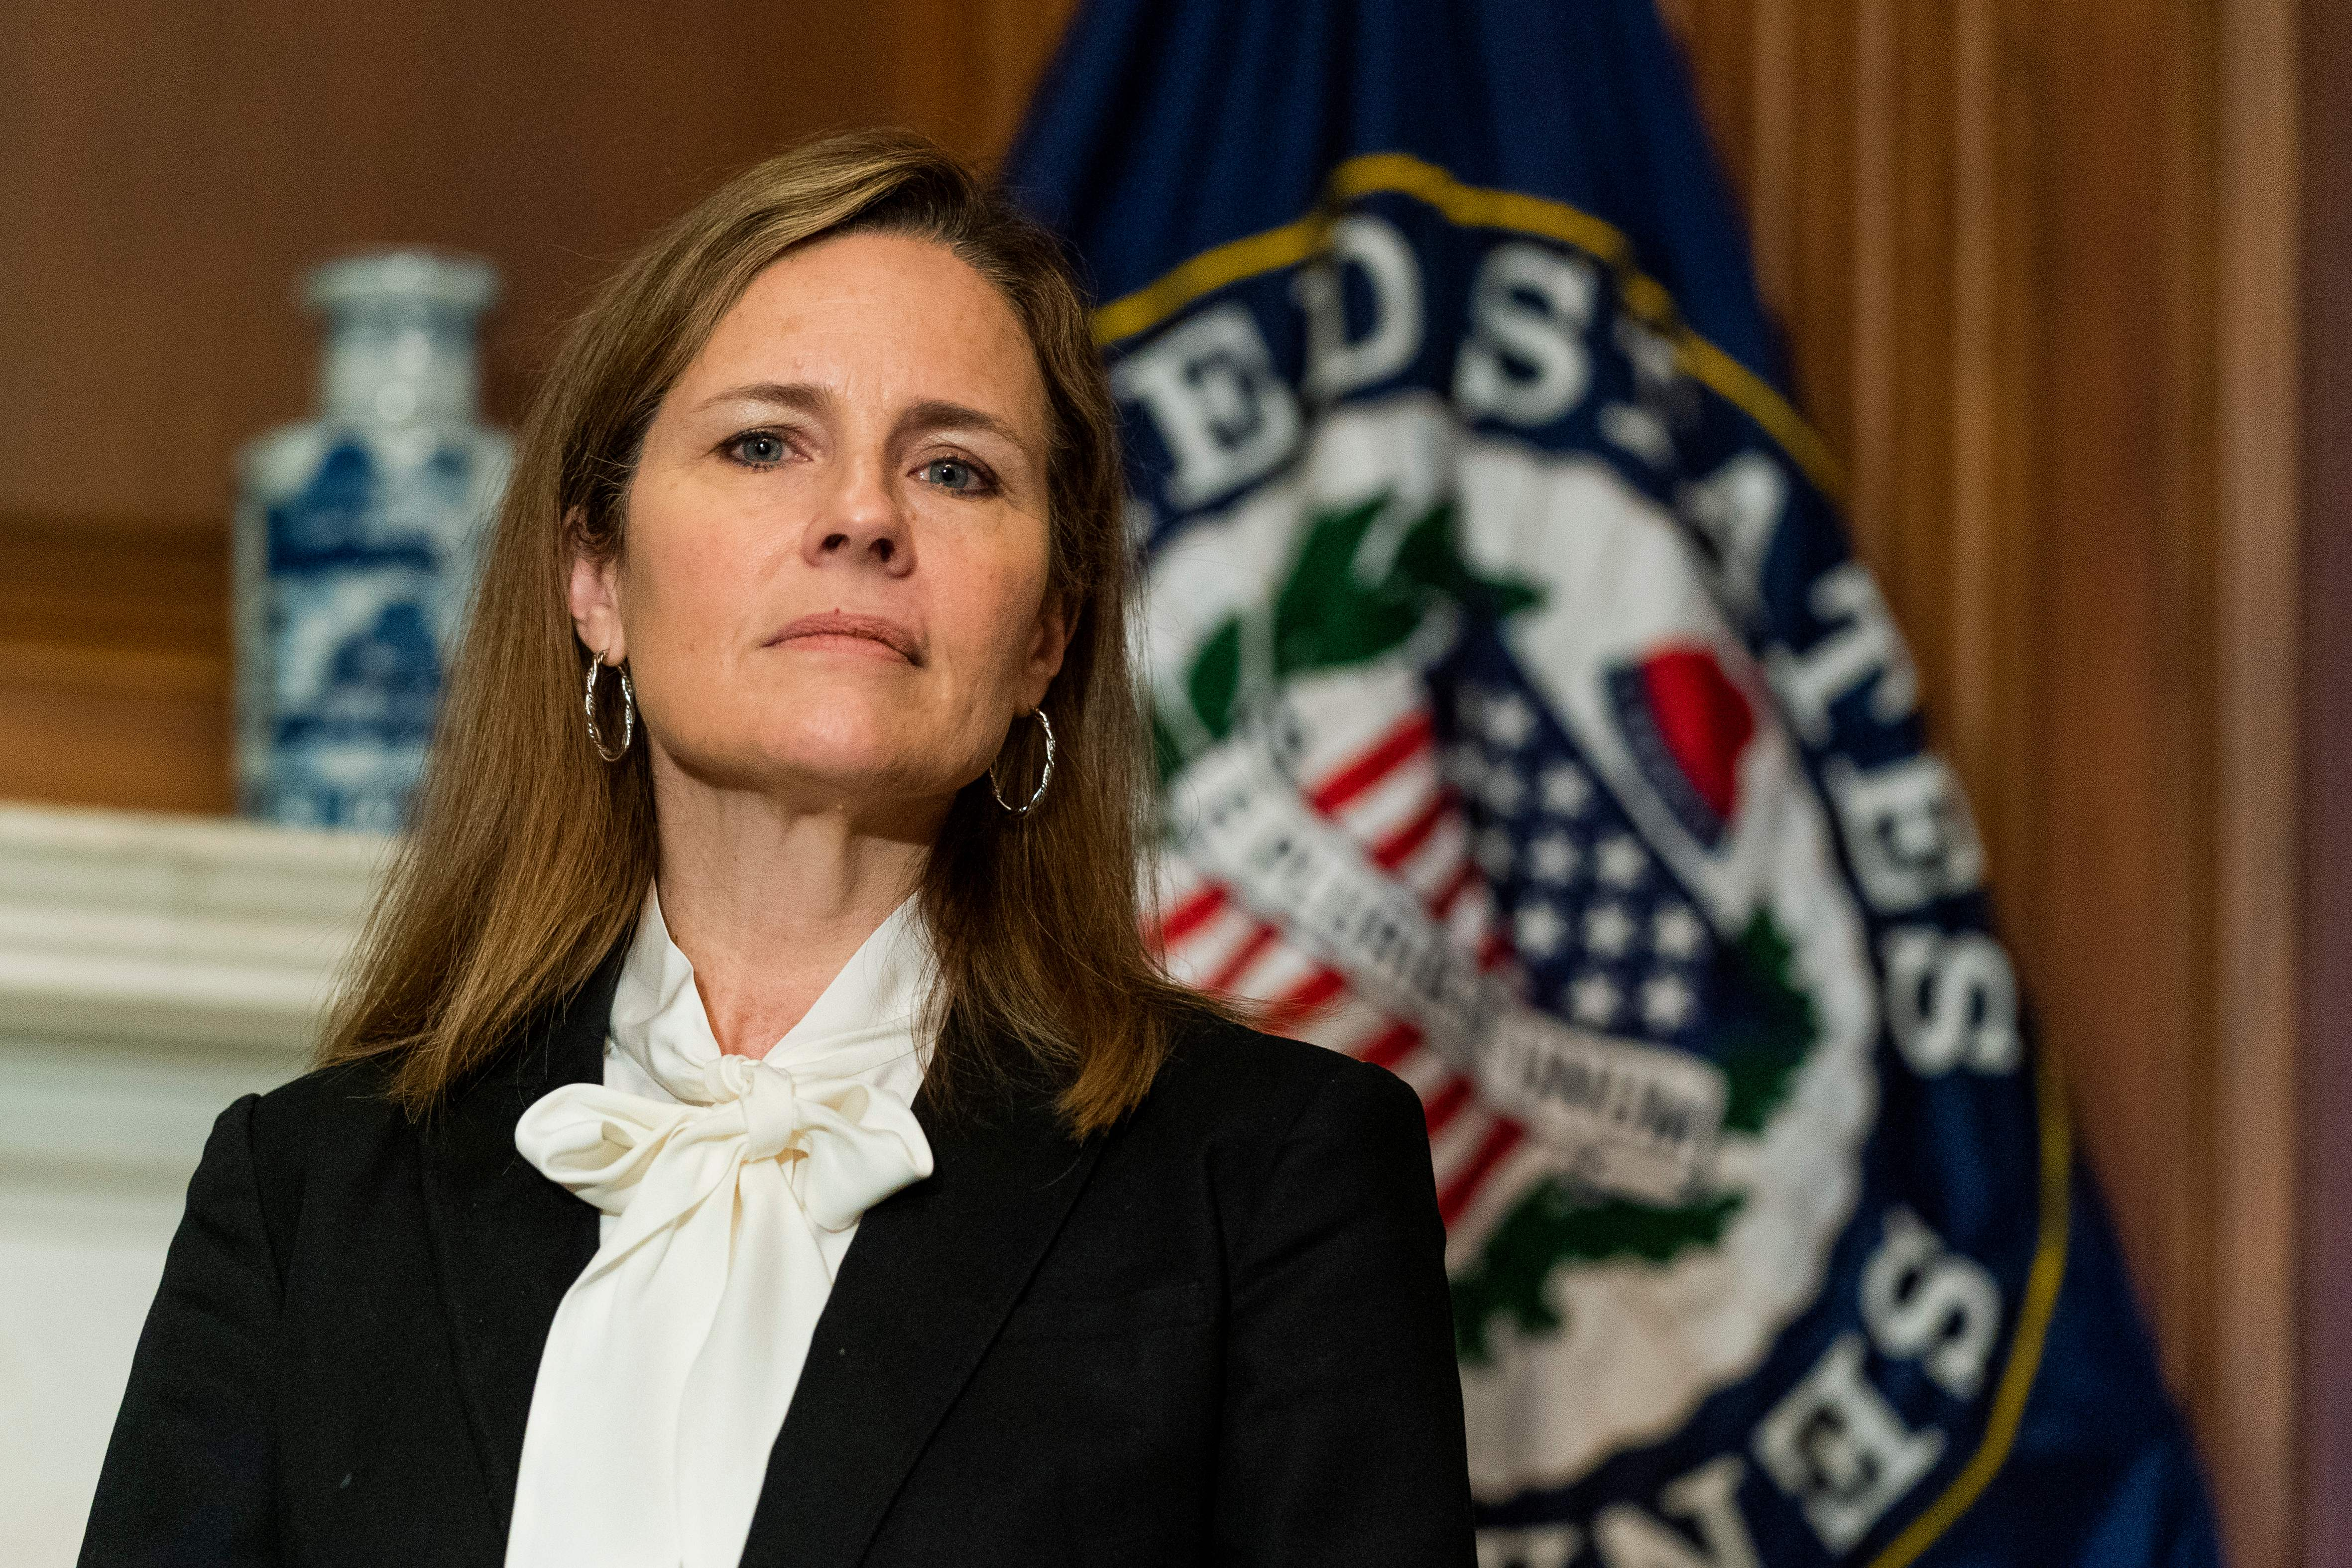 Senate set to confirm Judge Amy Coney Barrett to Supreme Court on Monday – CNBC